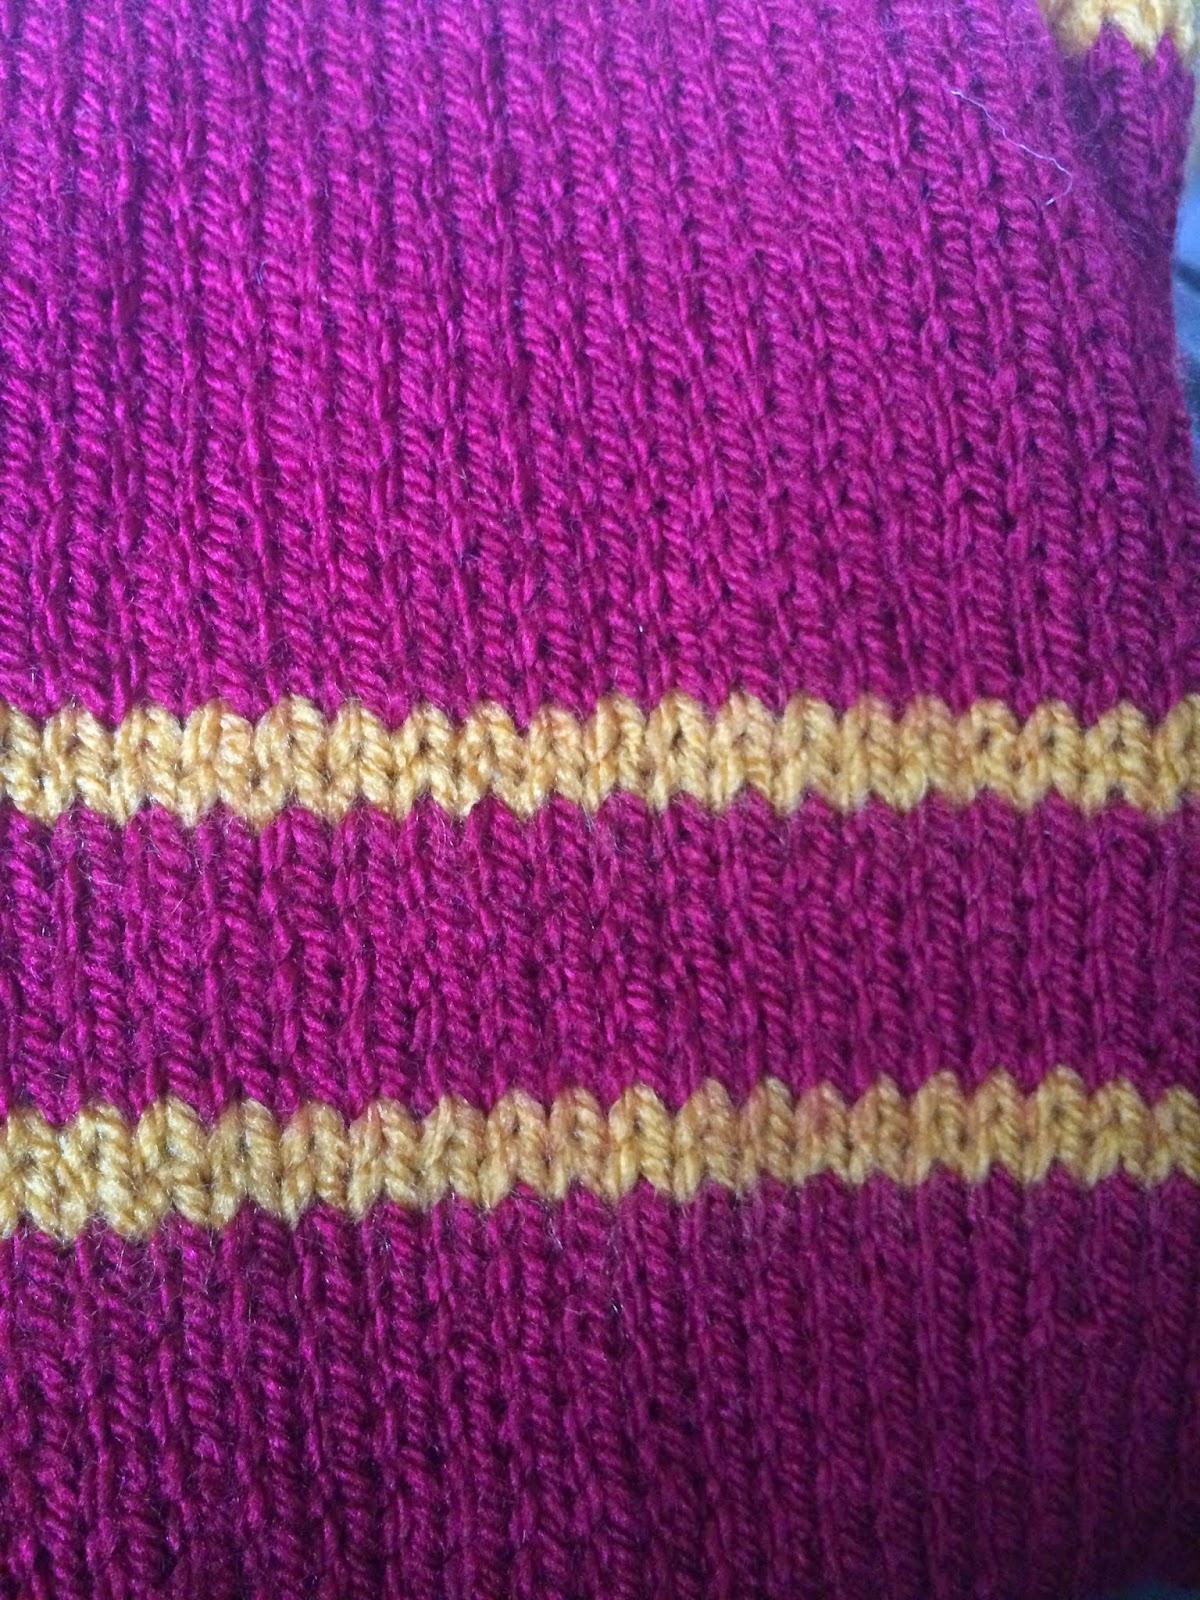 Hogwarts house scarves pattern | Knerdcraft